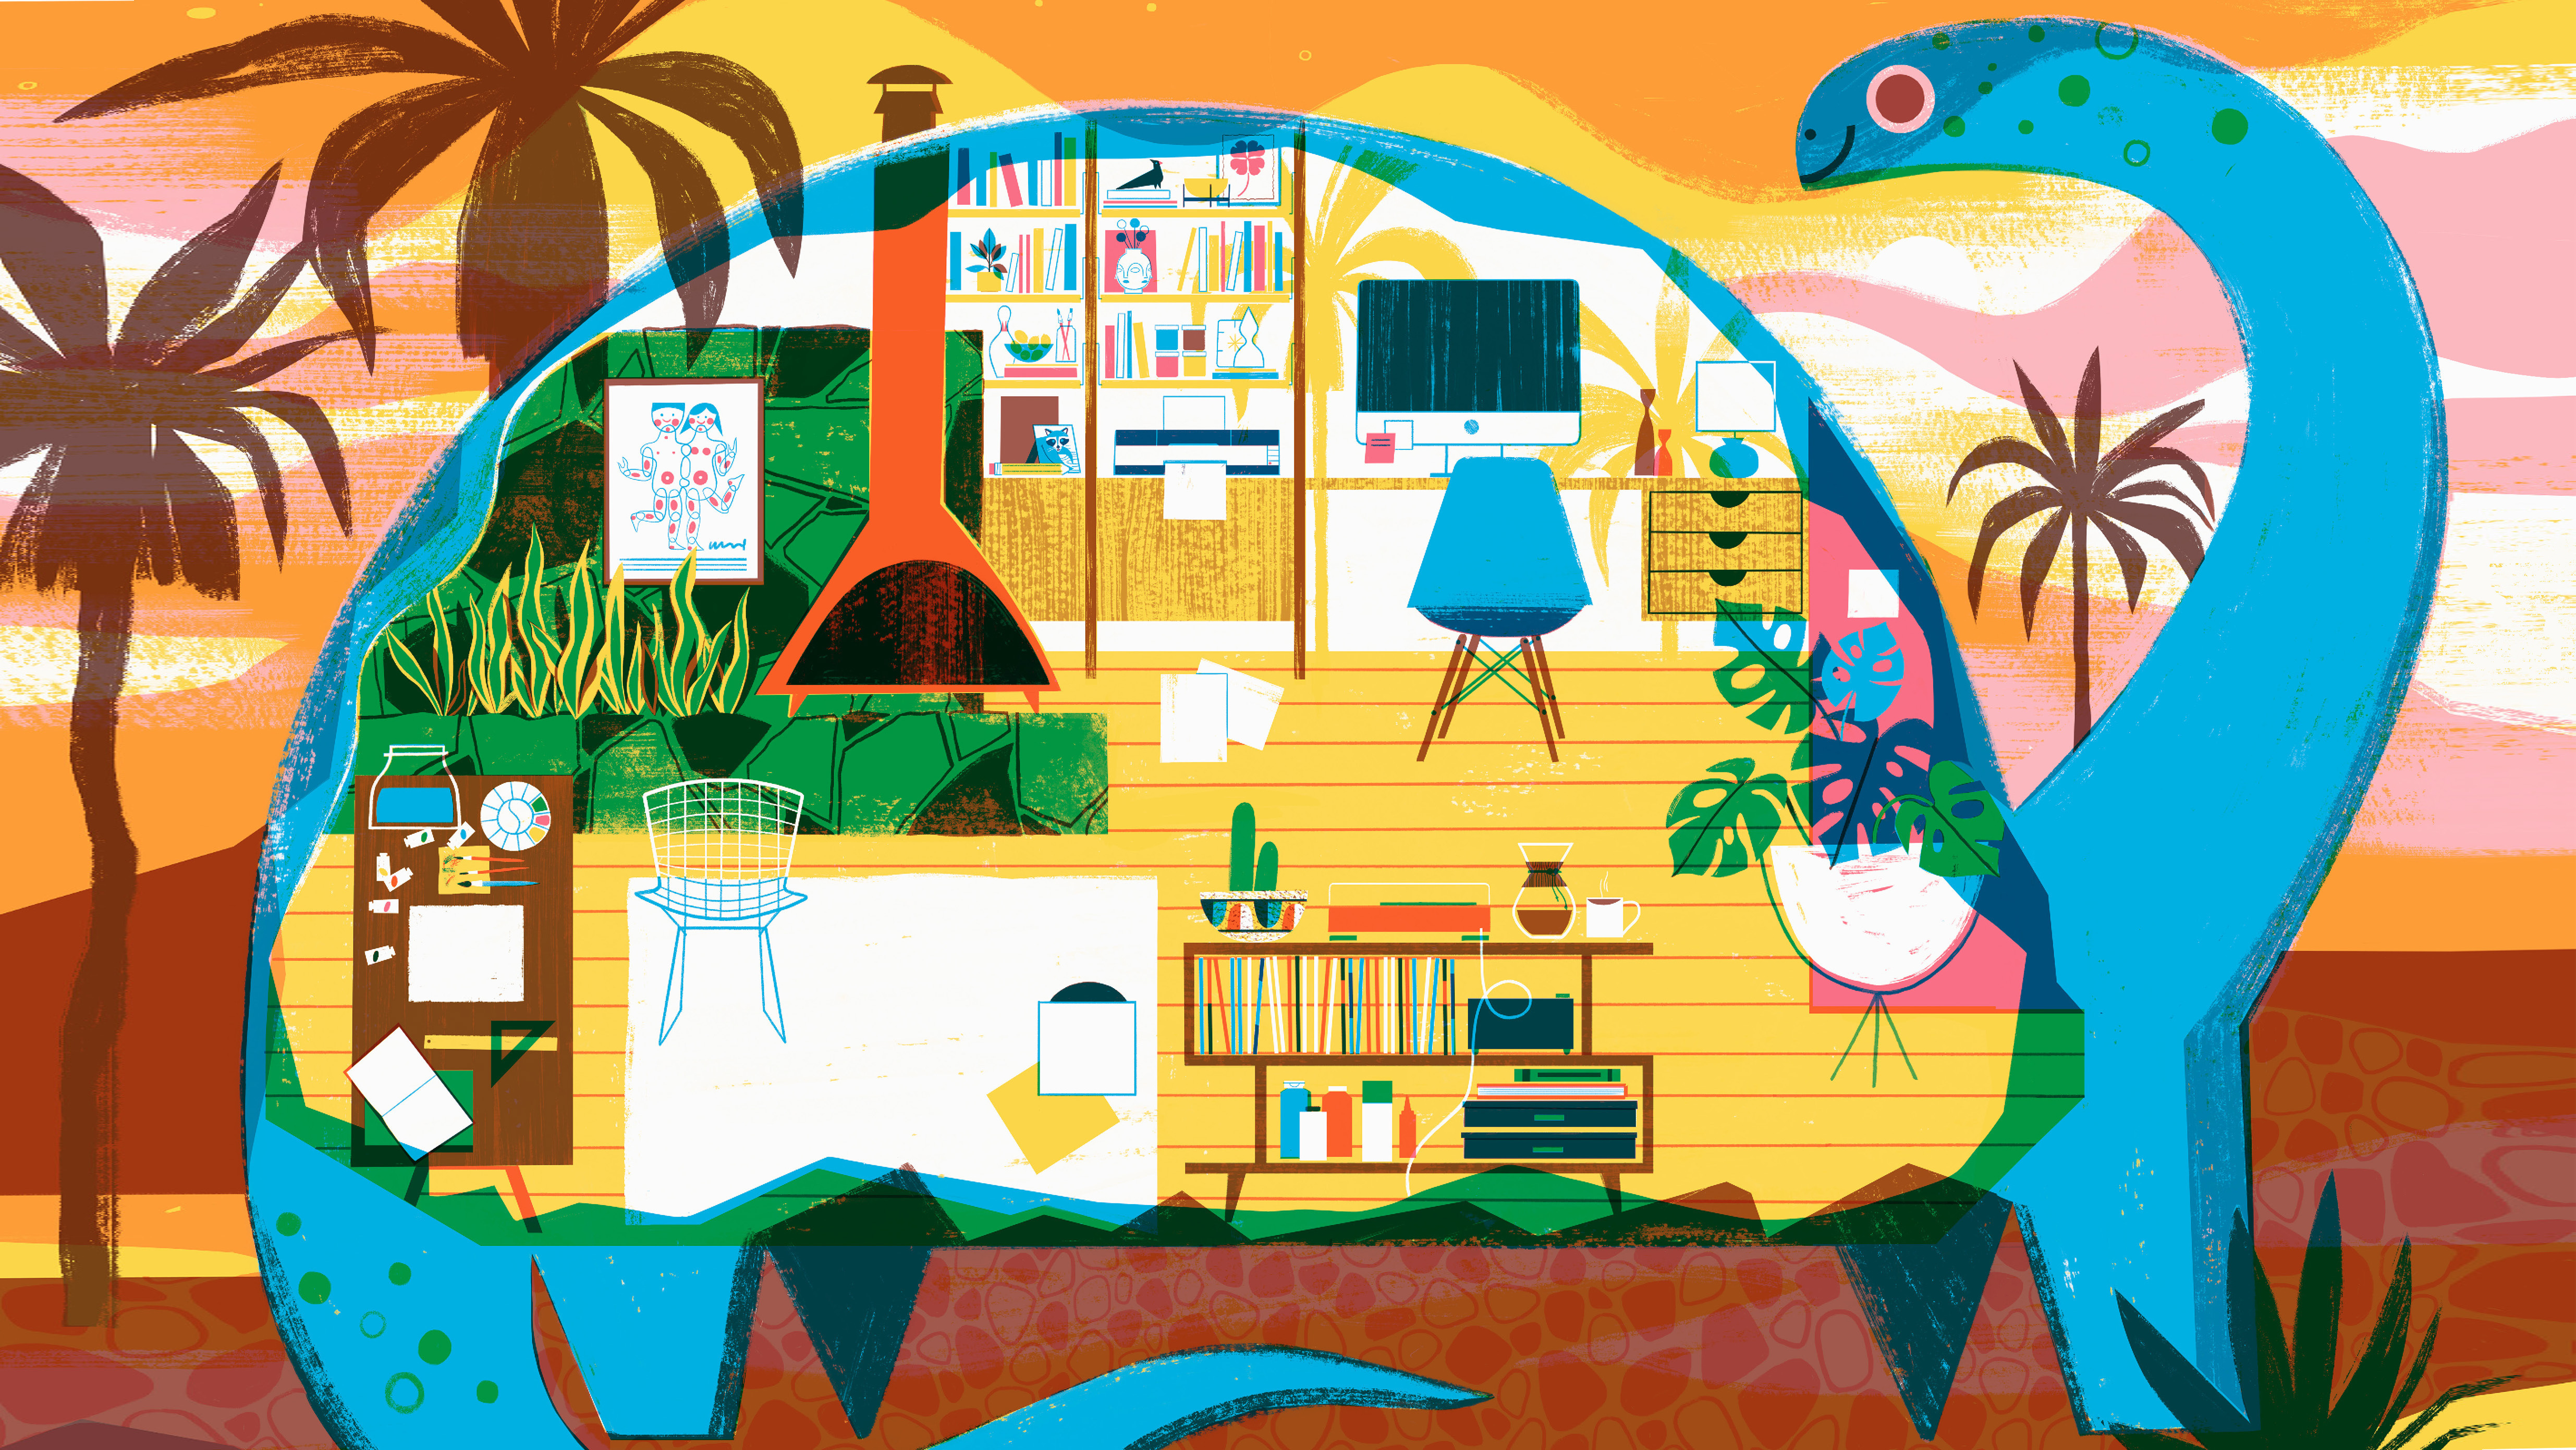 Illustration by Loris Lora